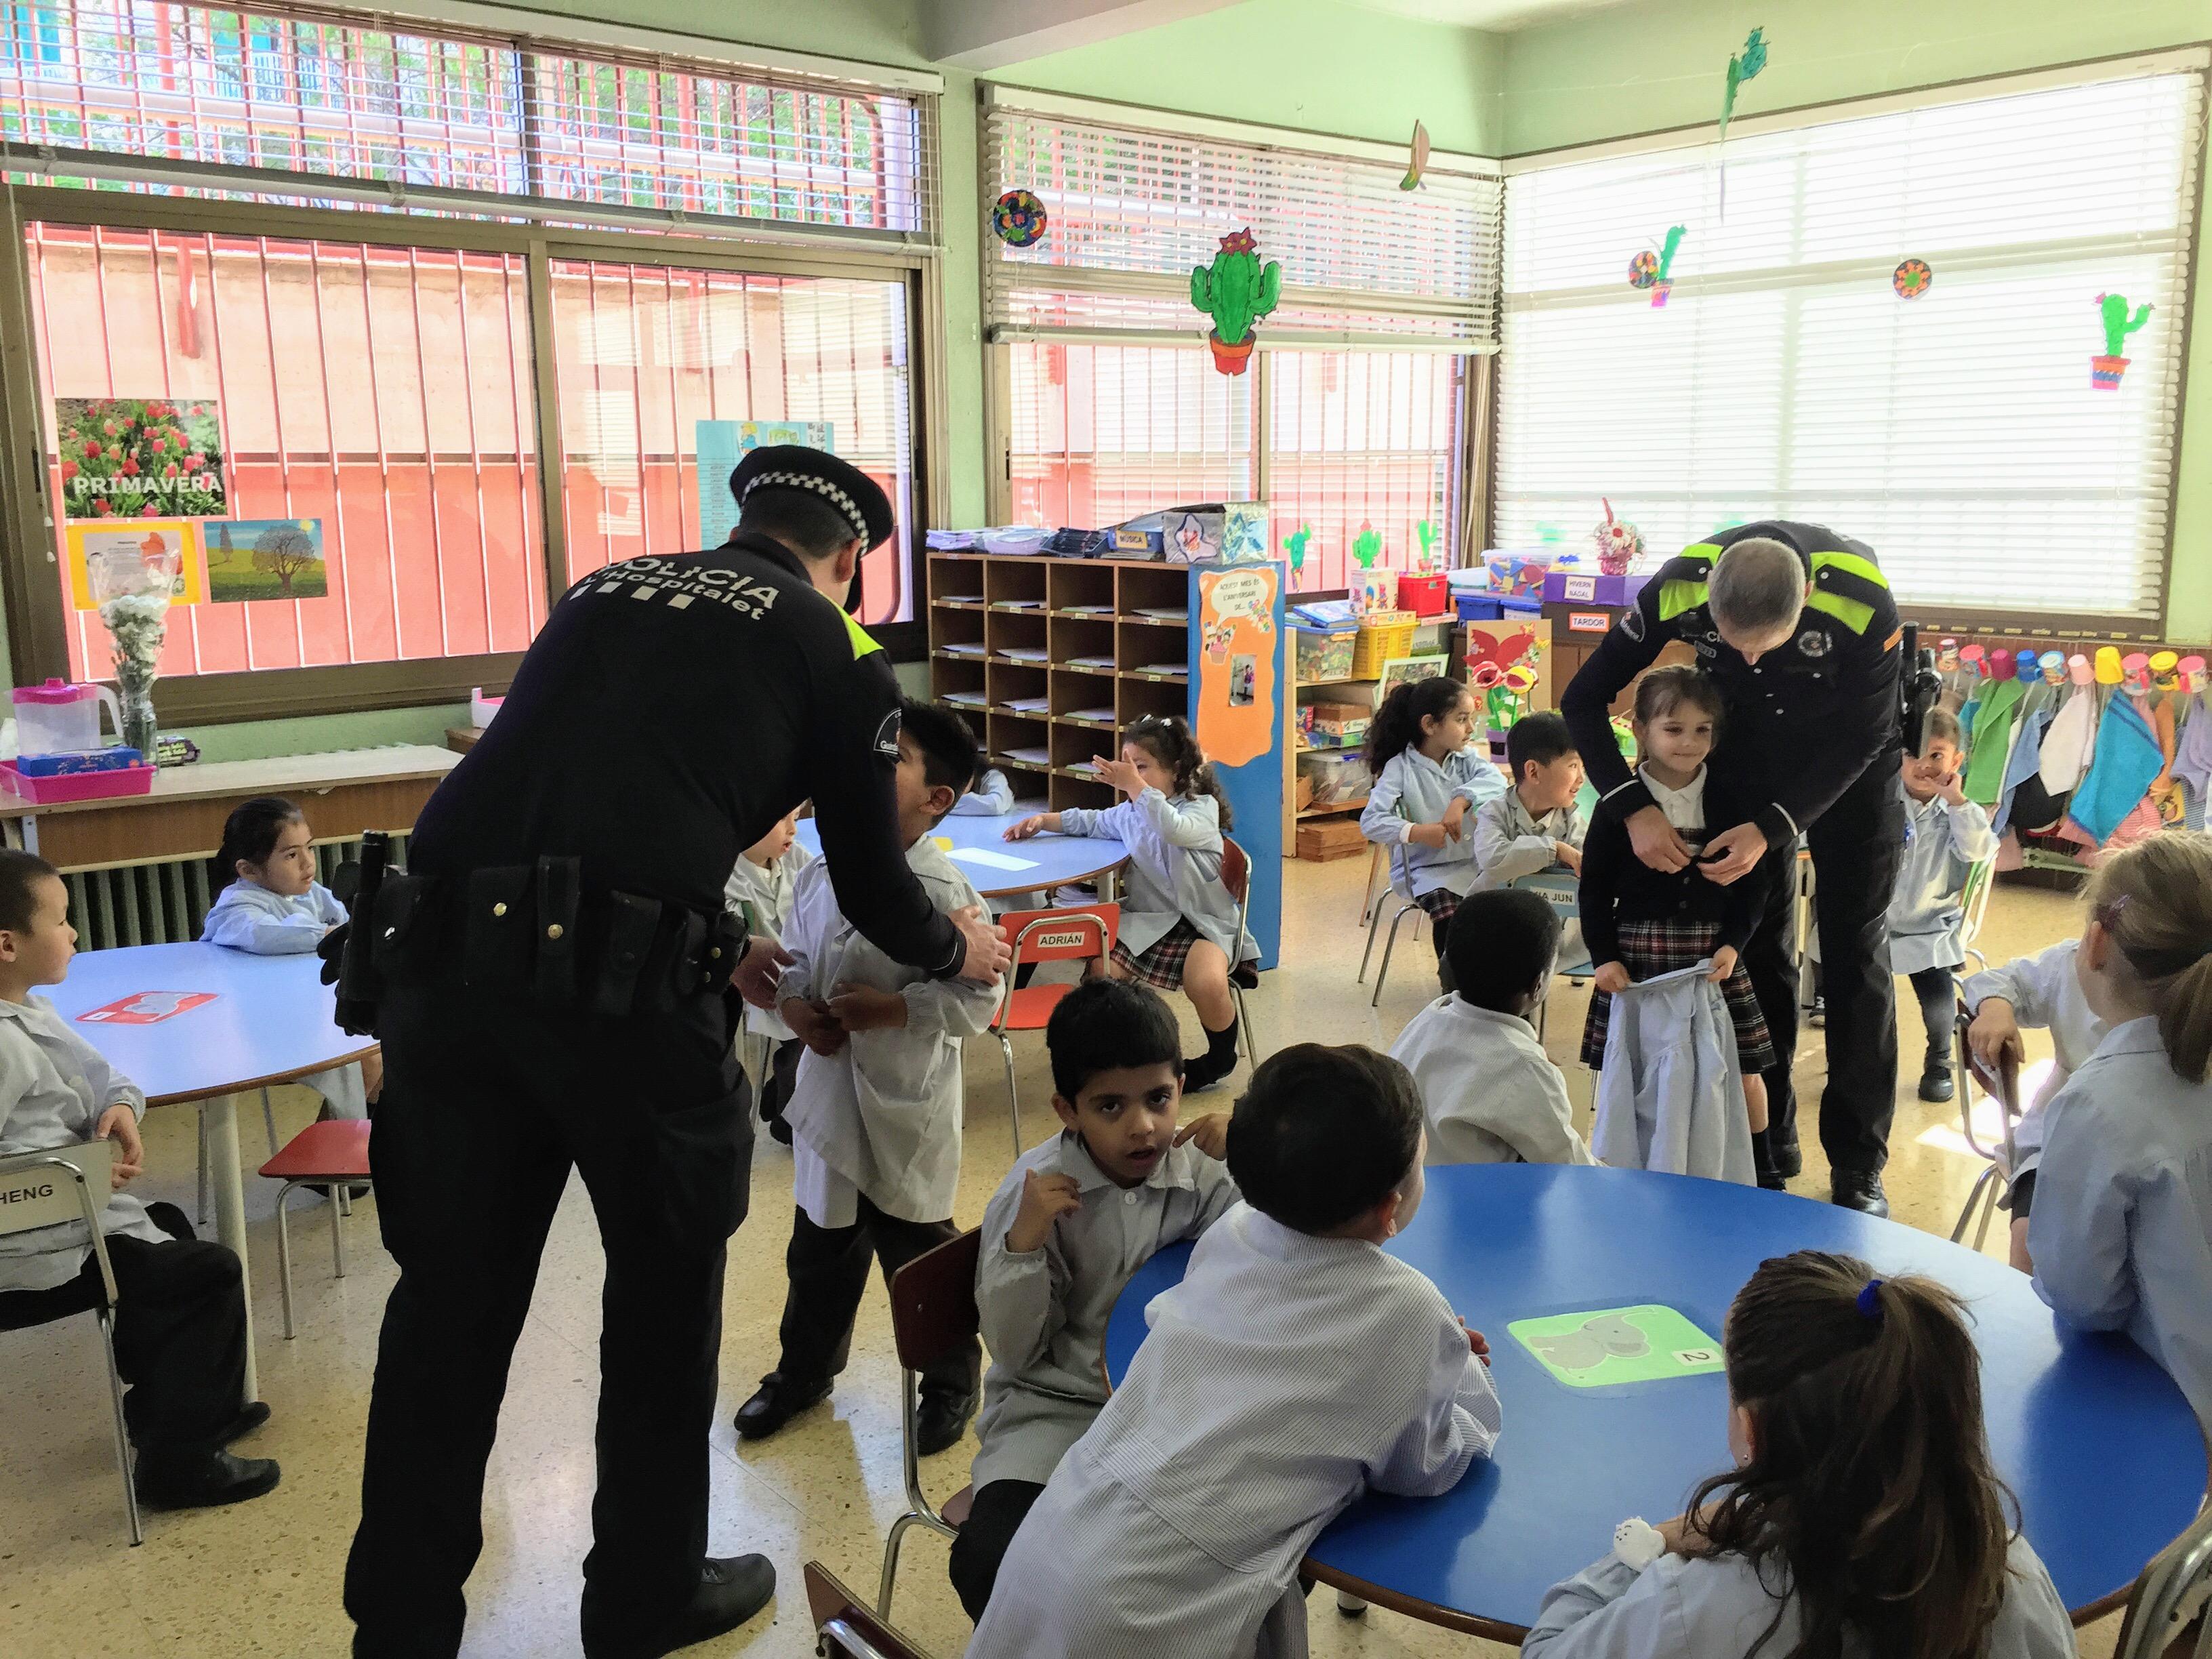 Educació Infatntil st Josep obrer Hospitalet Guàrdia urbana (11)